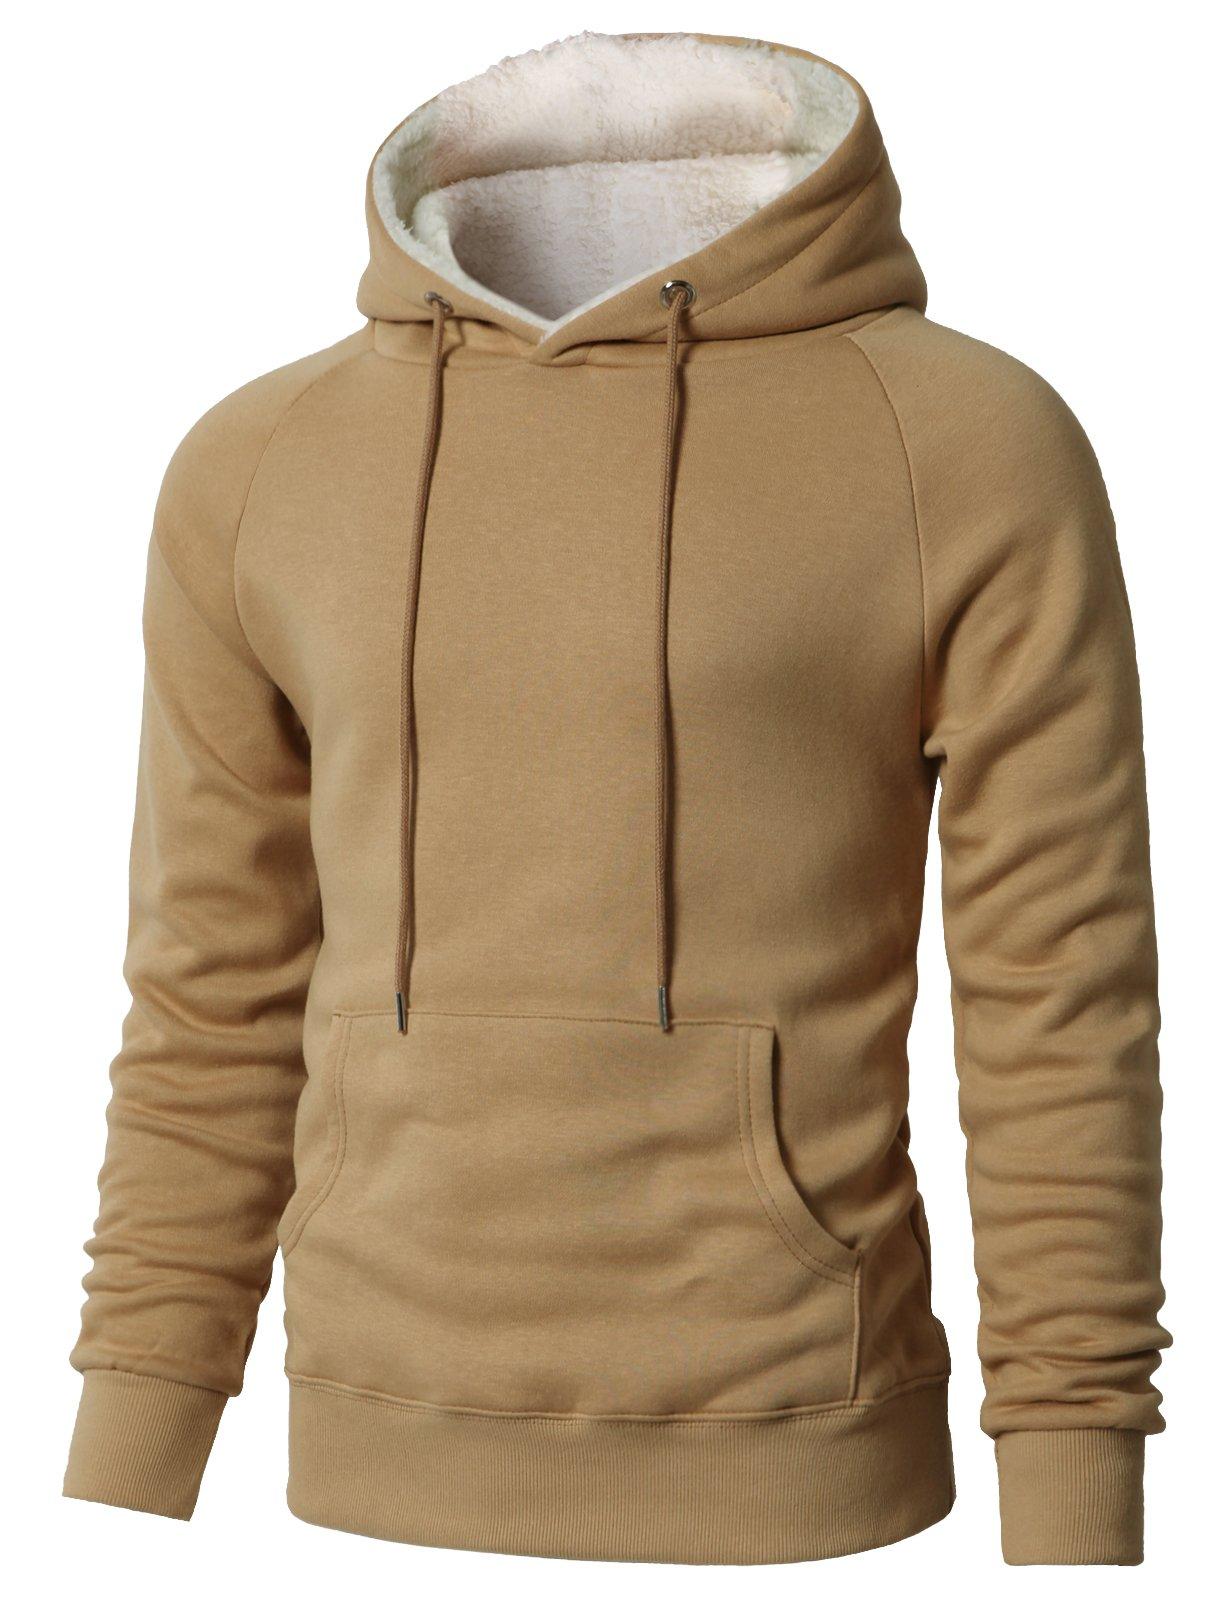 H2H Men's Fine Quality Plush Fleece Lined Pullover Beige US L/Asia XL (KMOHOL0126) by H2H (Image #1)